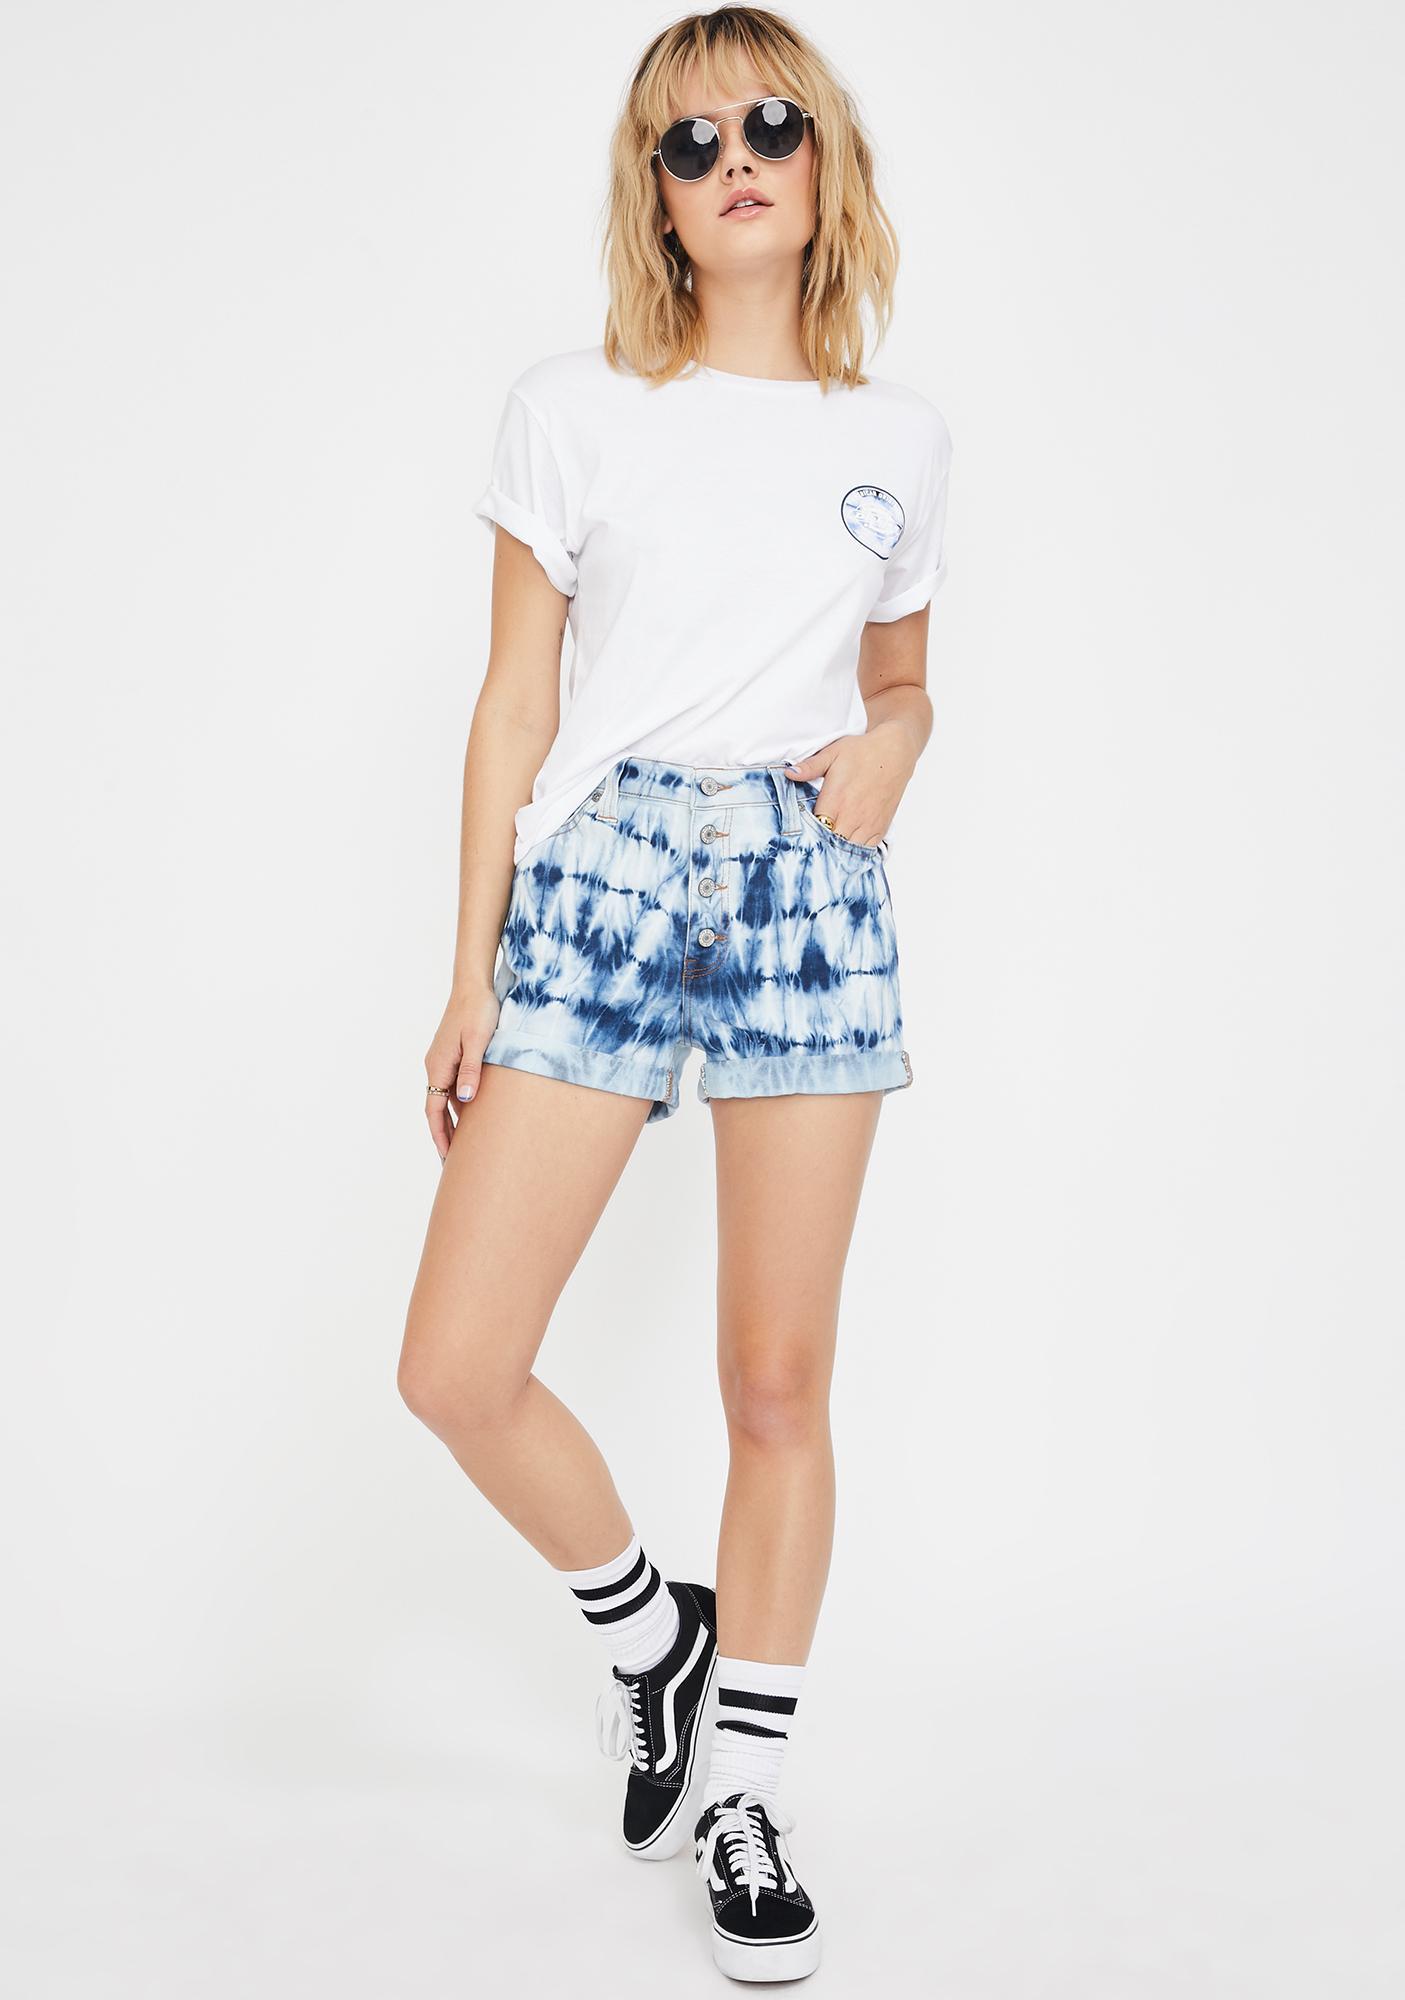 Dickies Girl Navy White Tie Dye Button Shorts